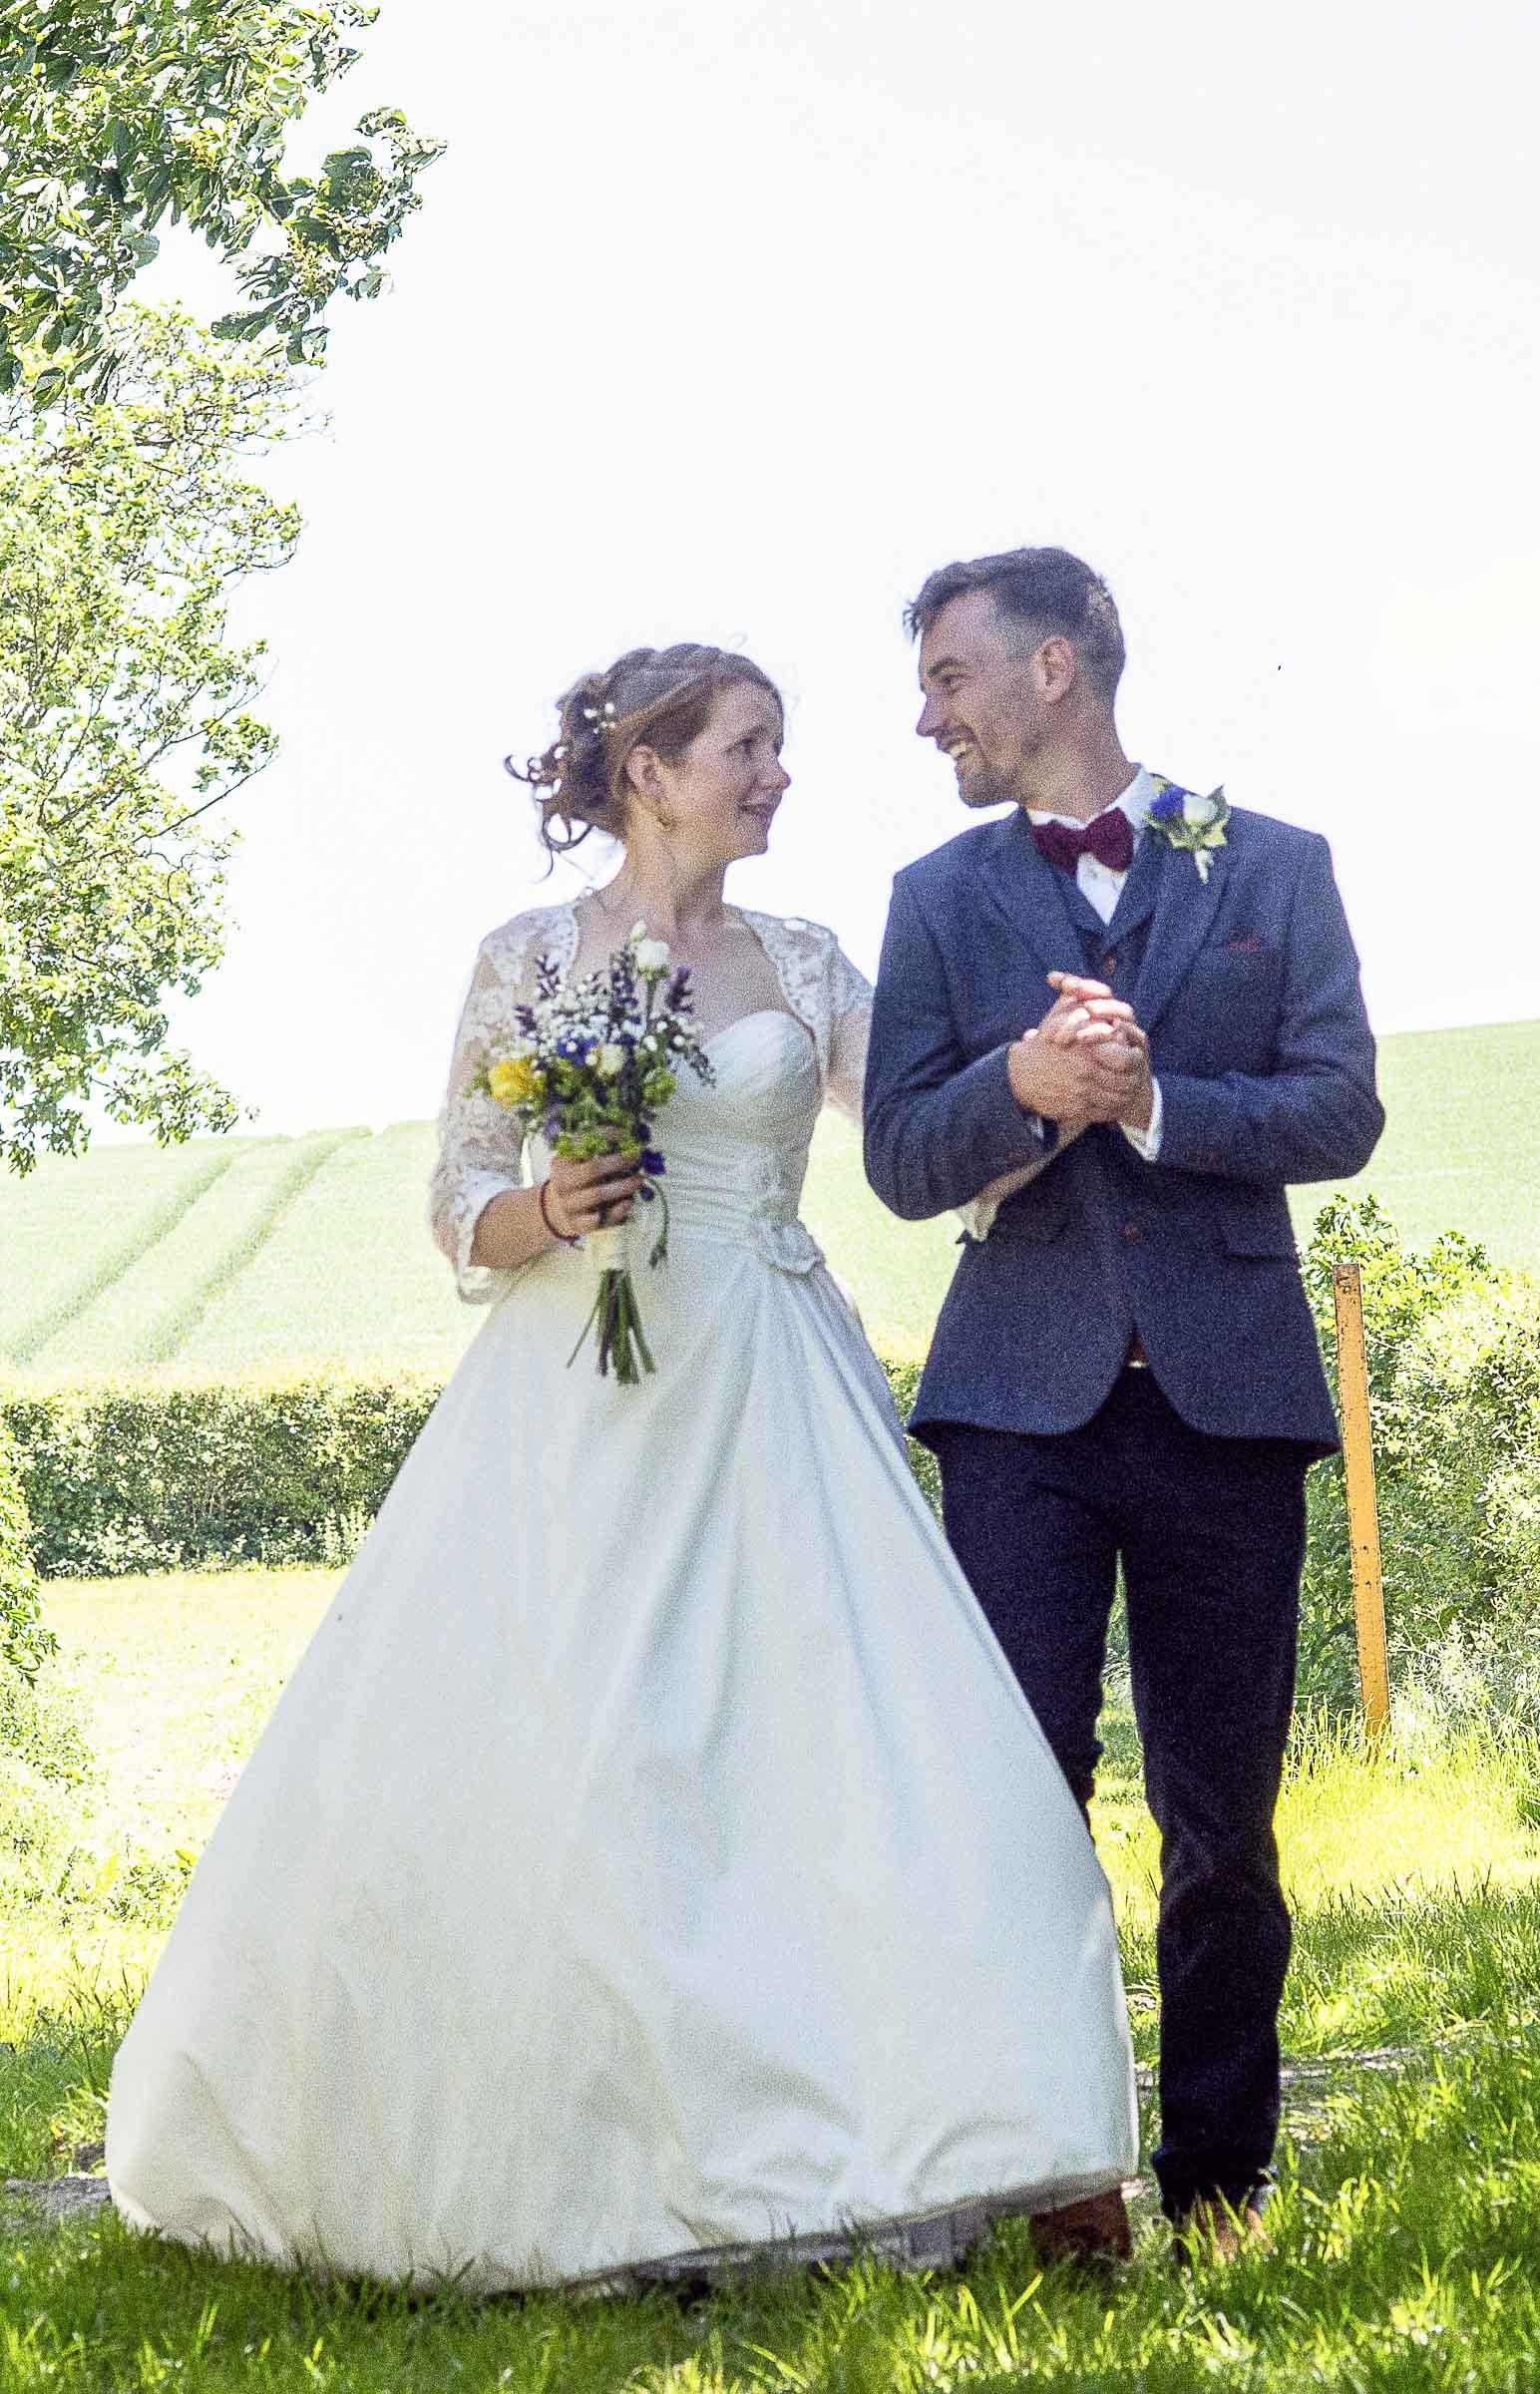 Bride and groom walking through a summer field